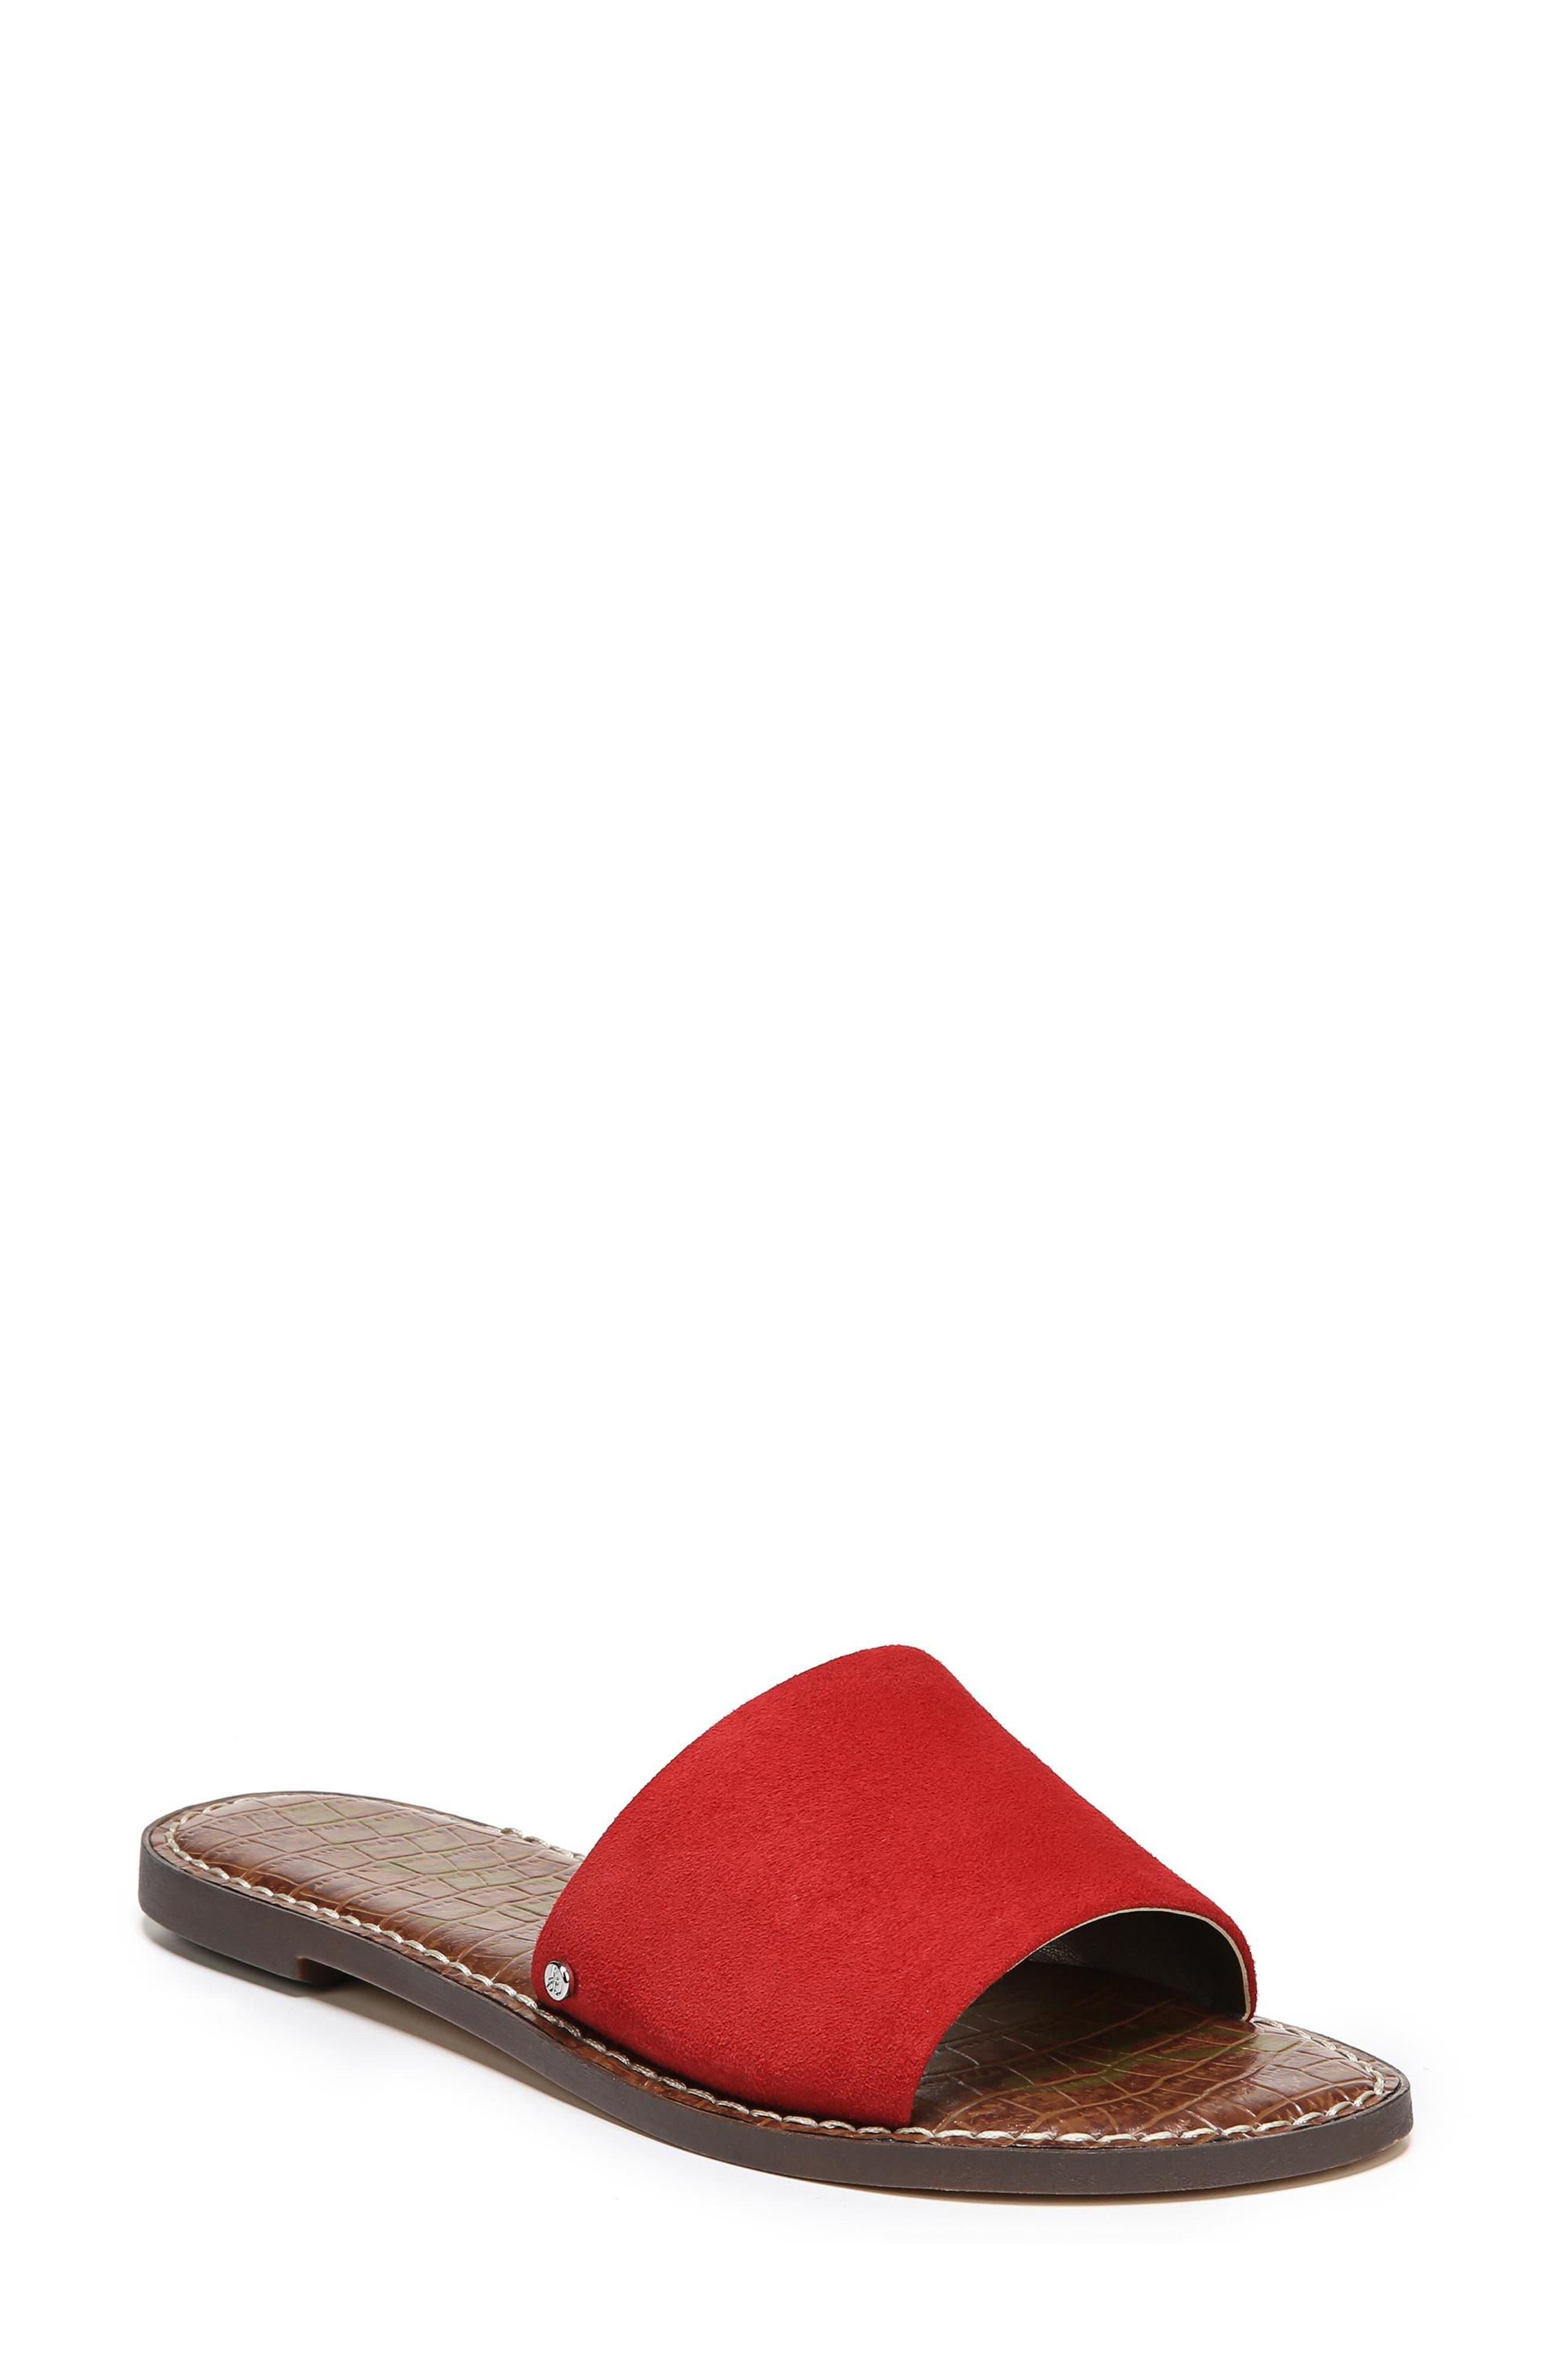 Little Girls nero Flat Love Heart Sandals F4Gag